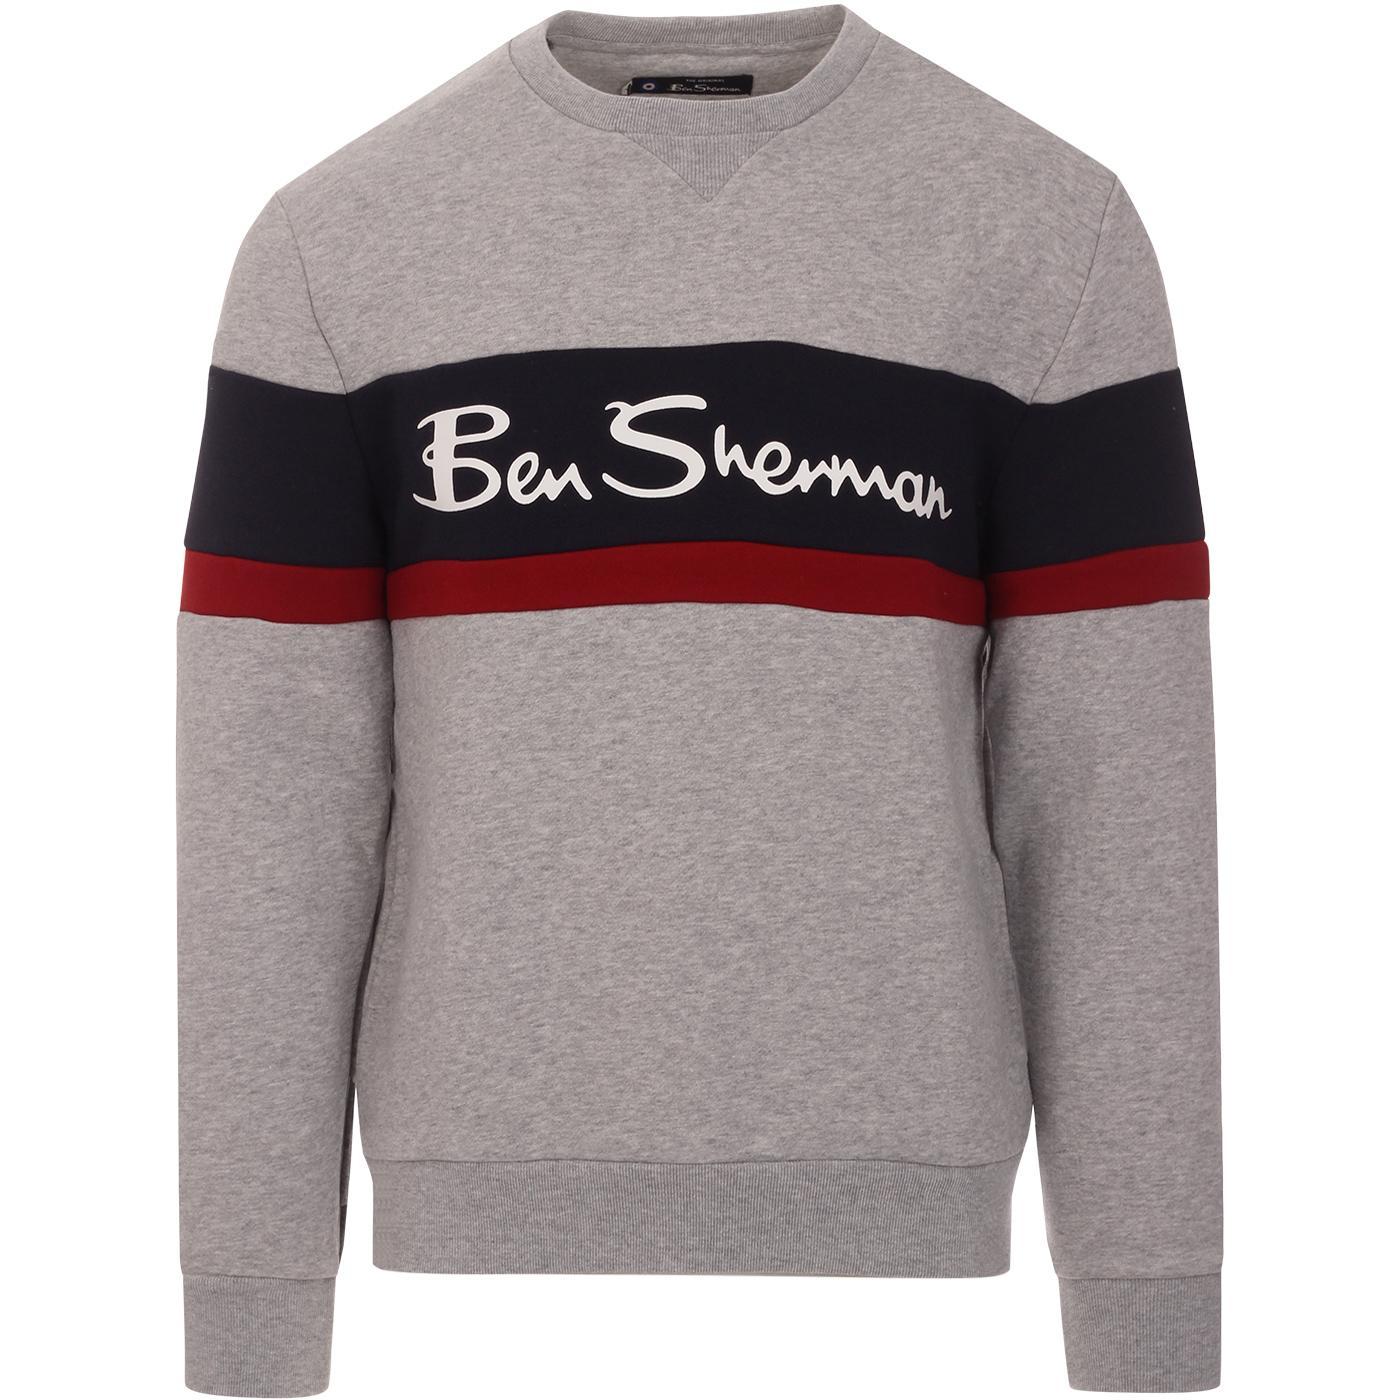 BEN SHERMAN Men's Retro 80s Sports Logo Sweatshirt